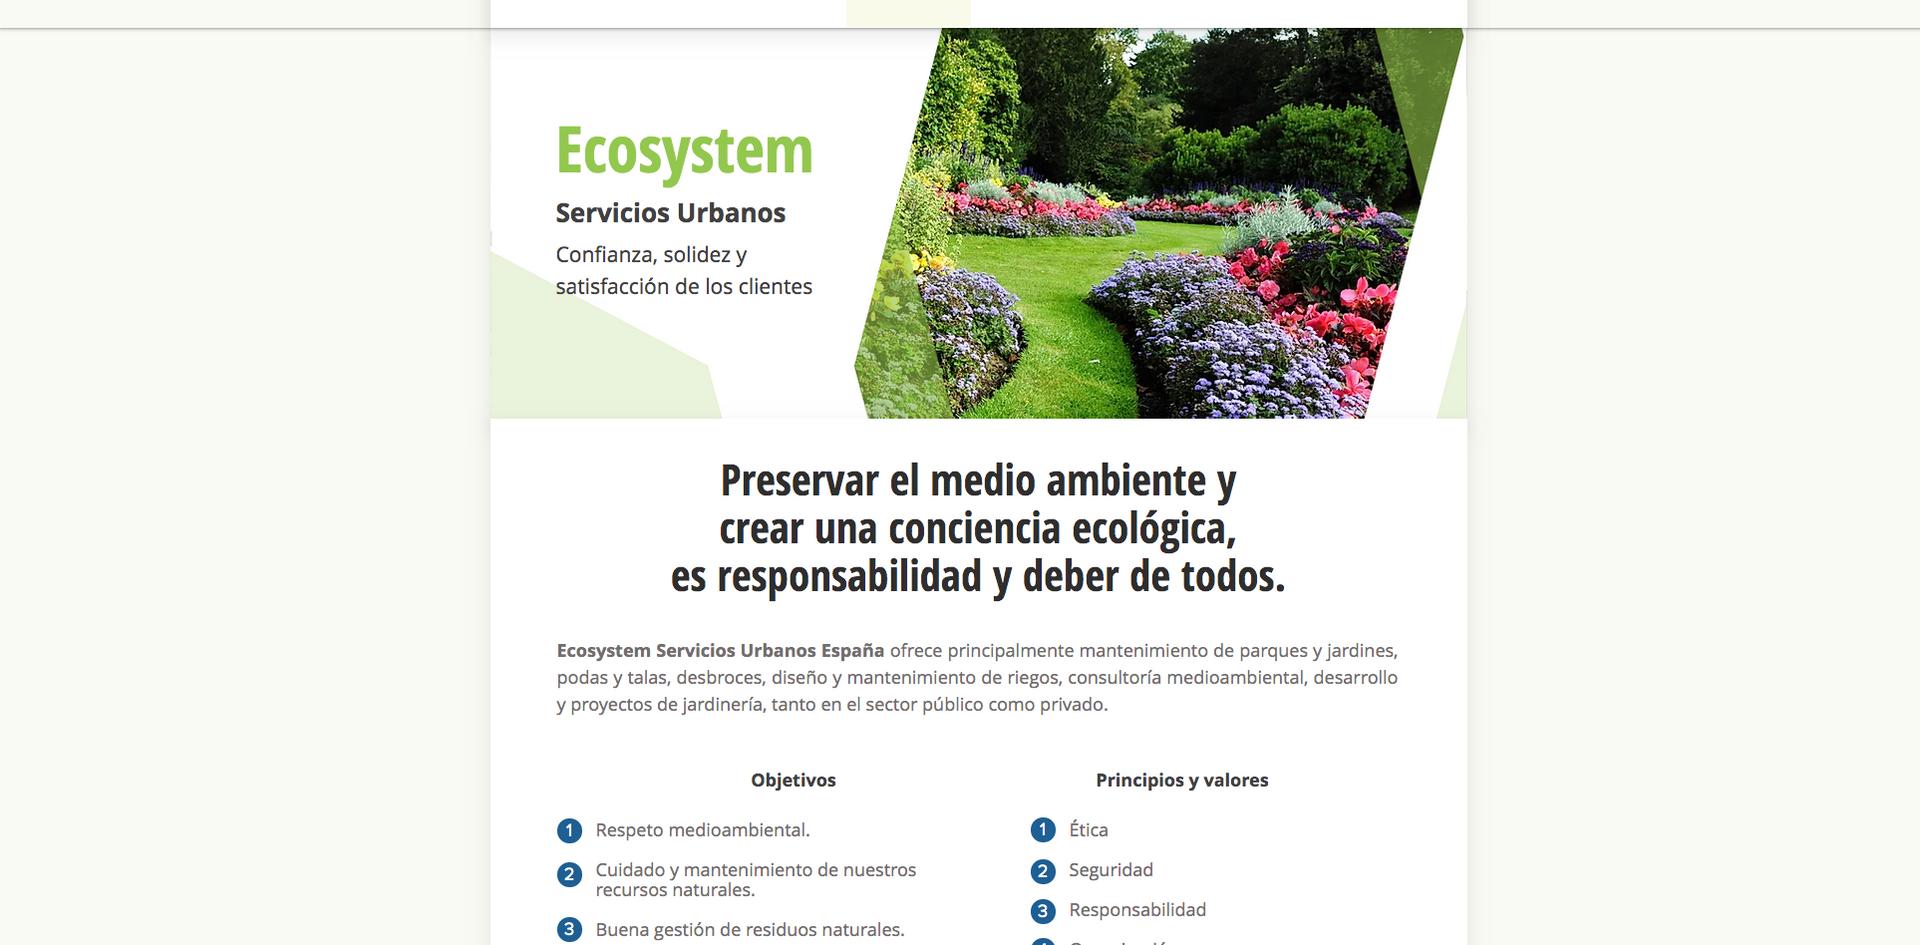 Ecosystem España